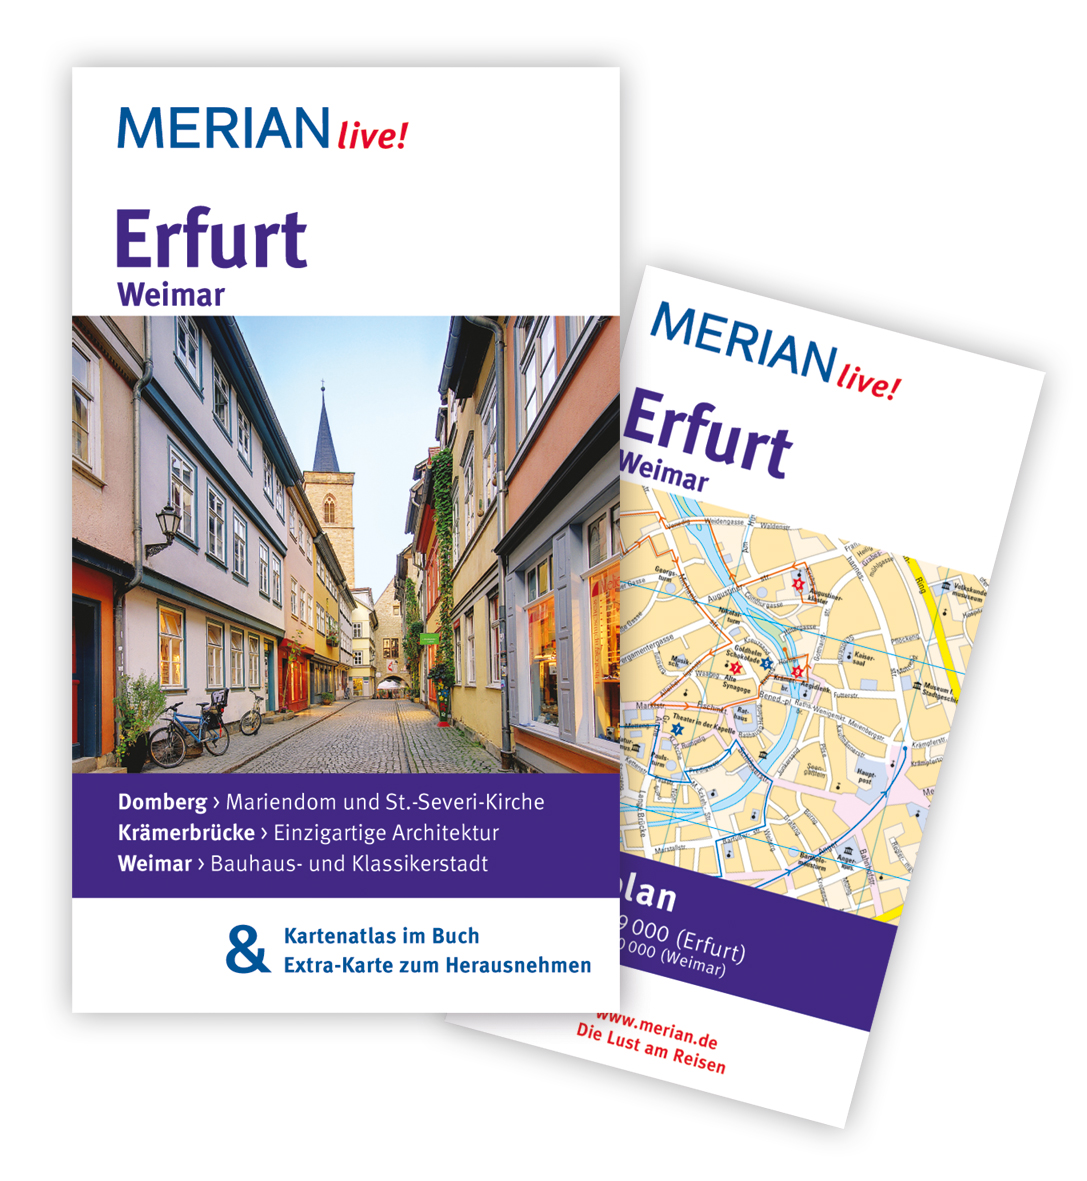 Erfurt Weimar: MERIAN live! - Mit Kartenatlas i...